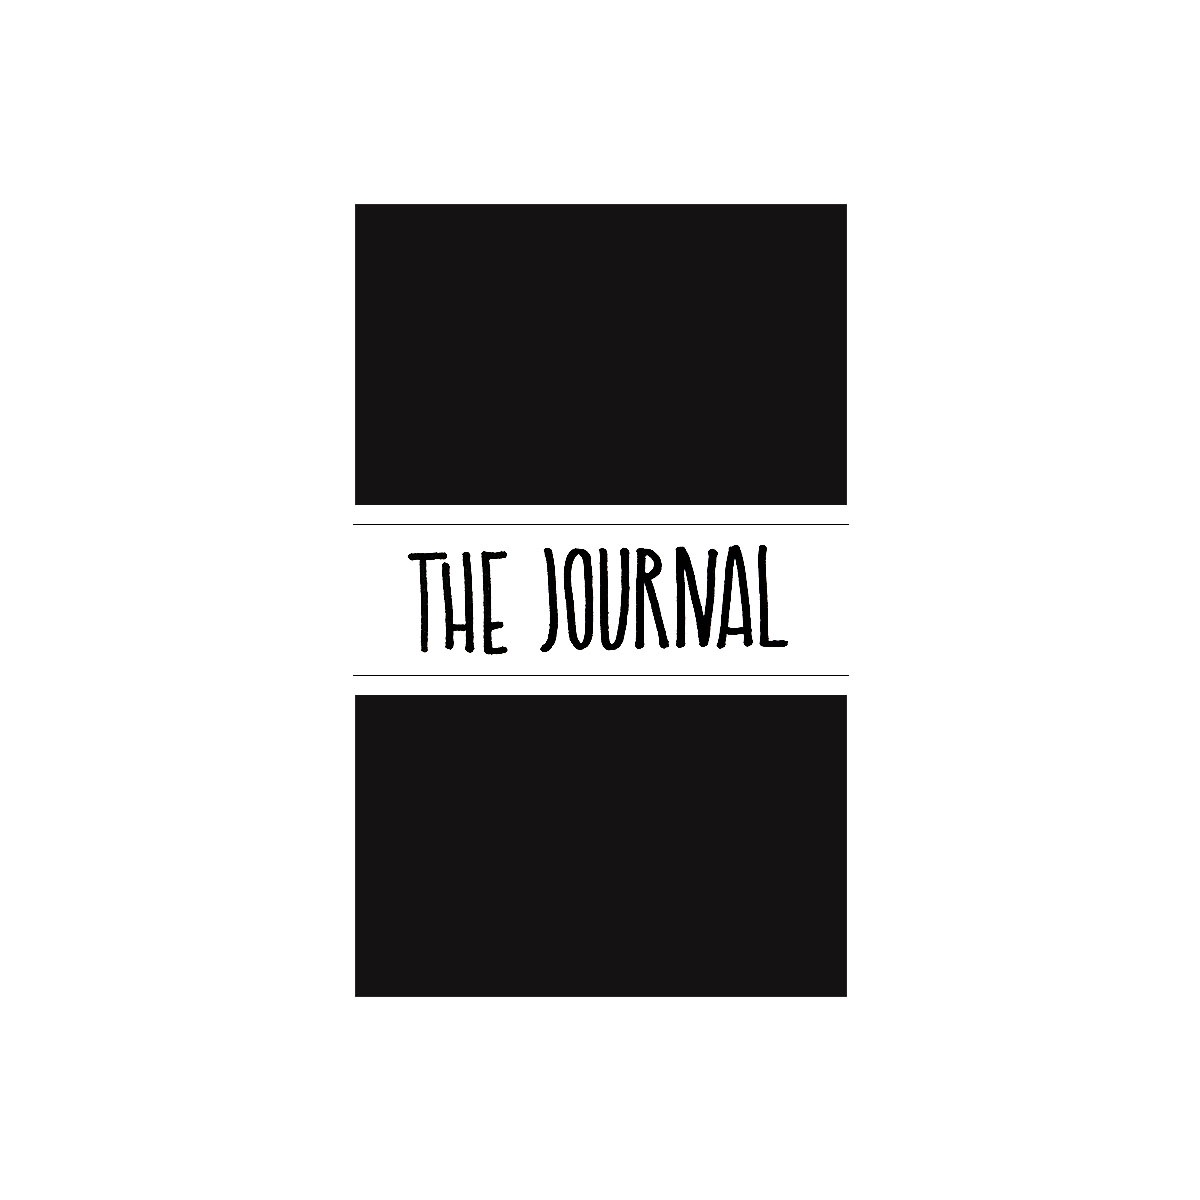 Maxgoodz Ежедневник The Journal Смола, 2 тетради, A5